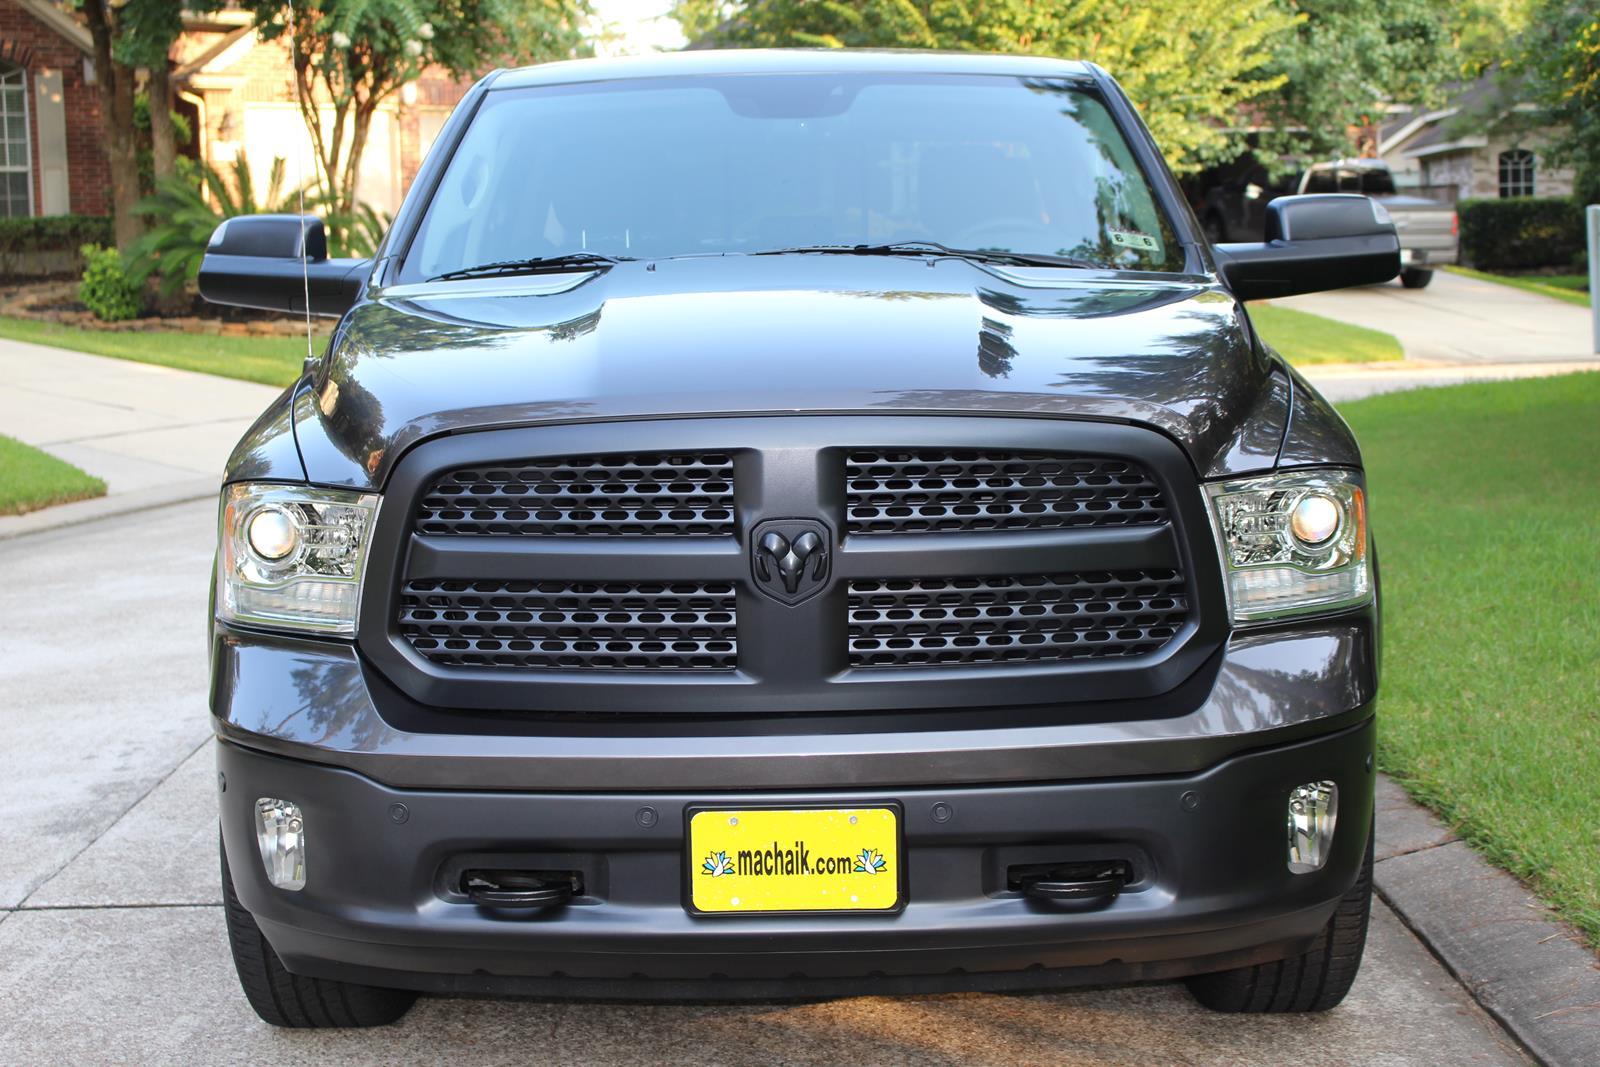 Dodge Ram 1500 Diesel >> PLASTI DIP: Pictures? How too? How's it look and last